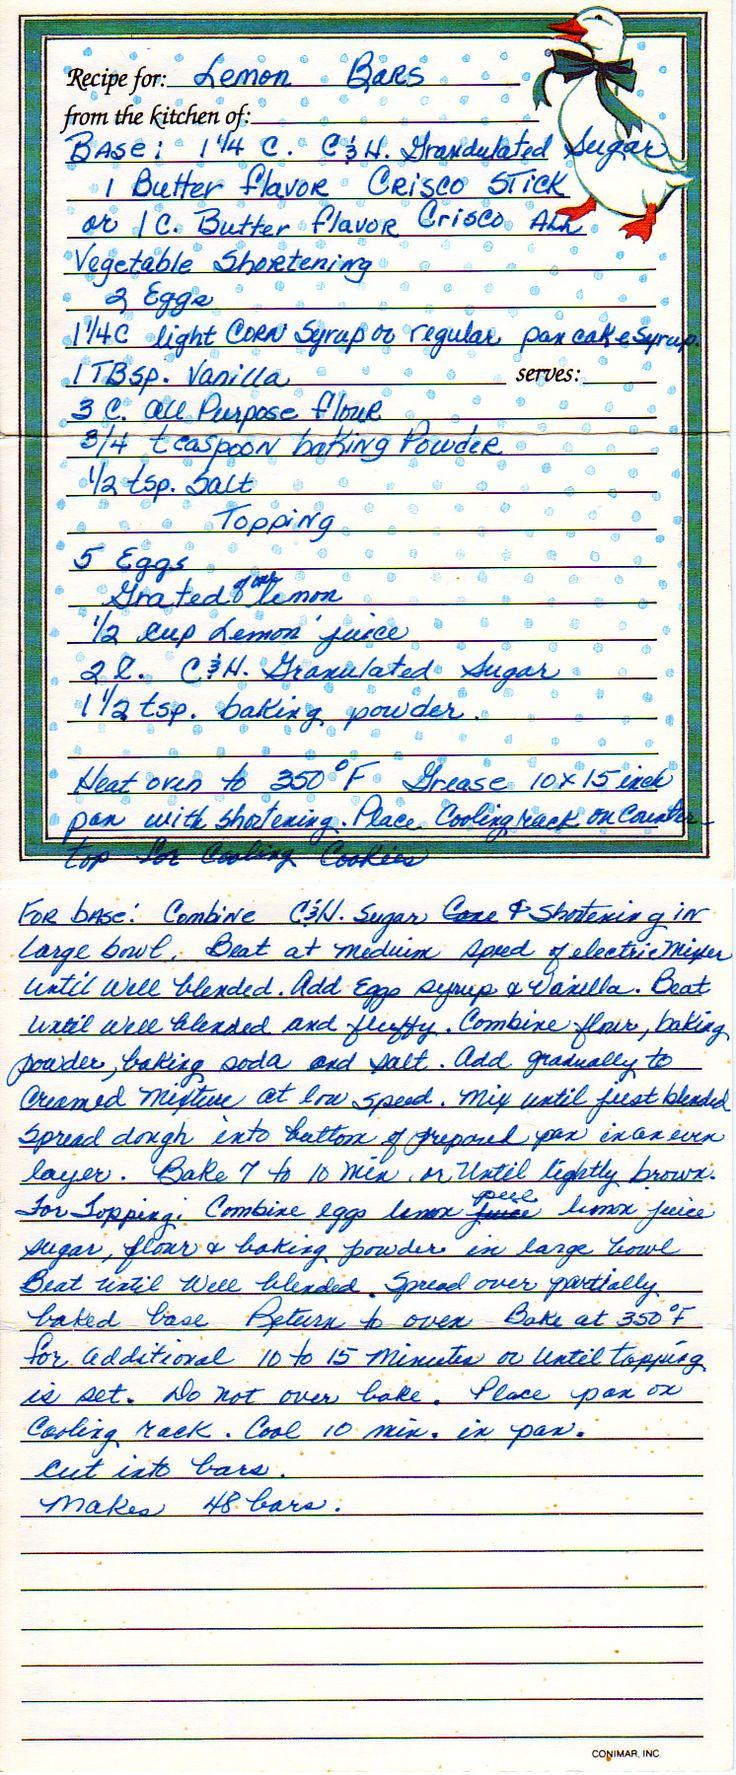 295 best Handwritten Recipes images on Pinterest | Vintage recipes ...